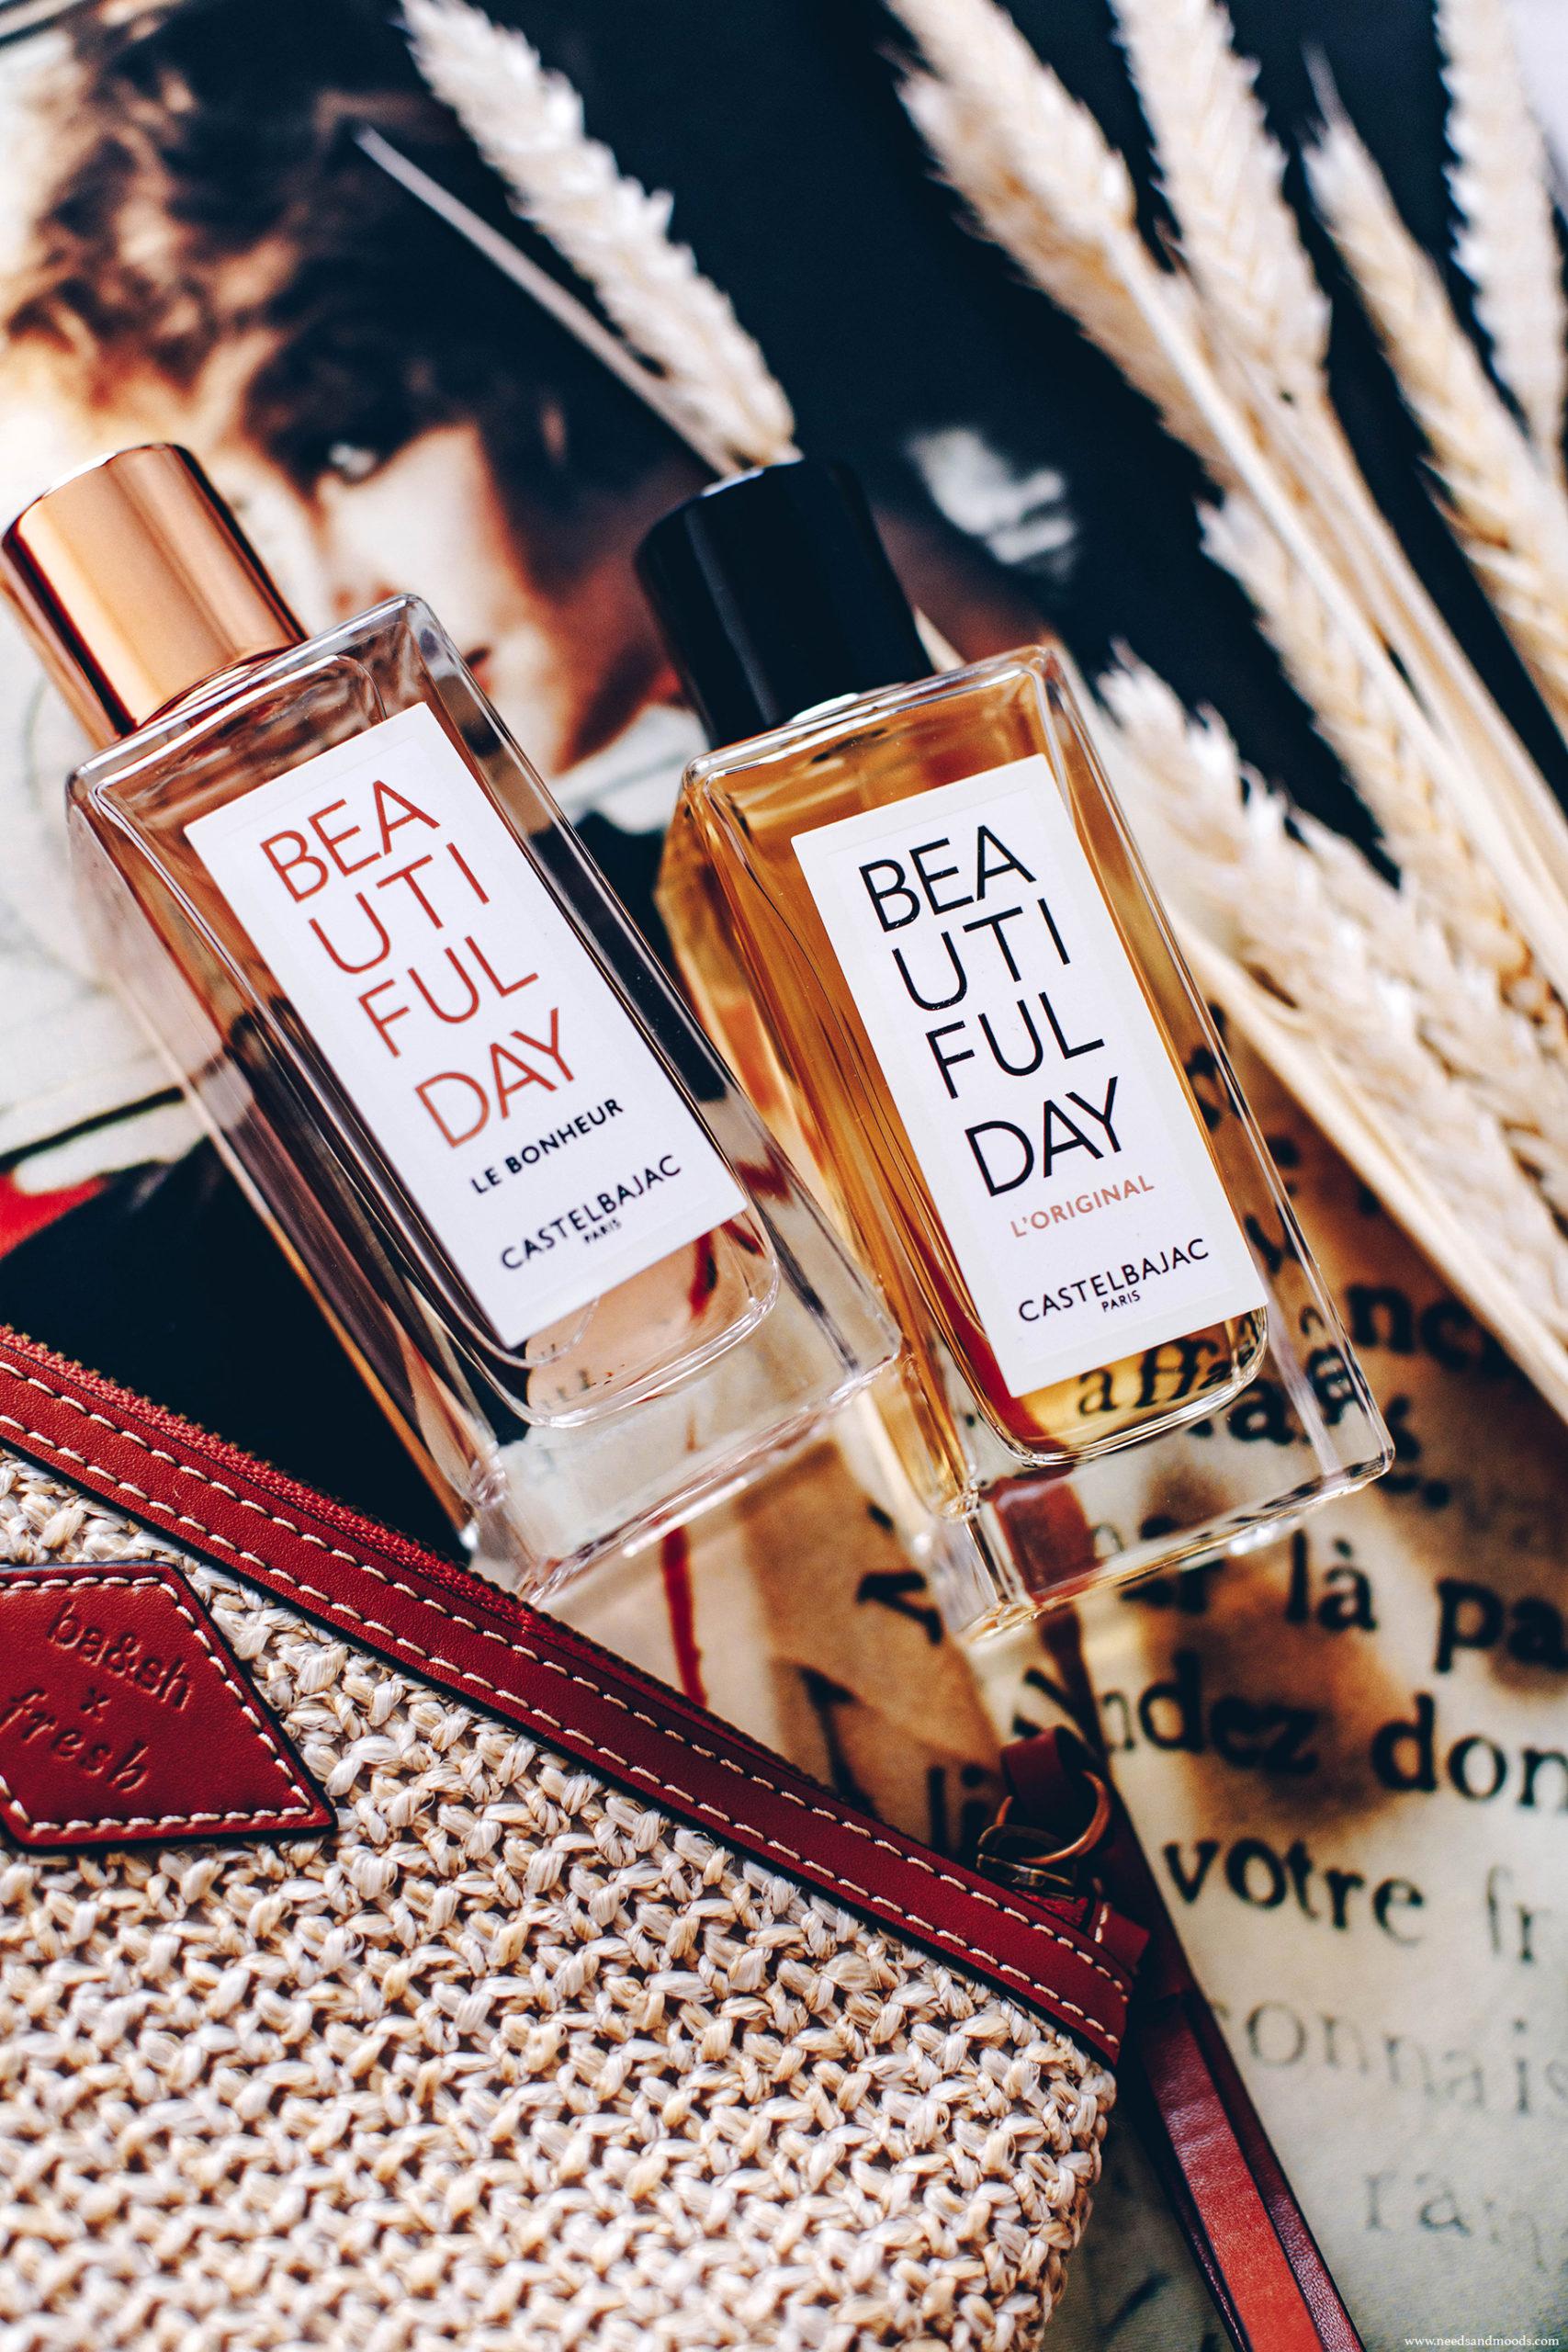 castelbajac beautiful day le bonheur